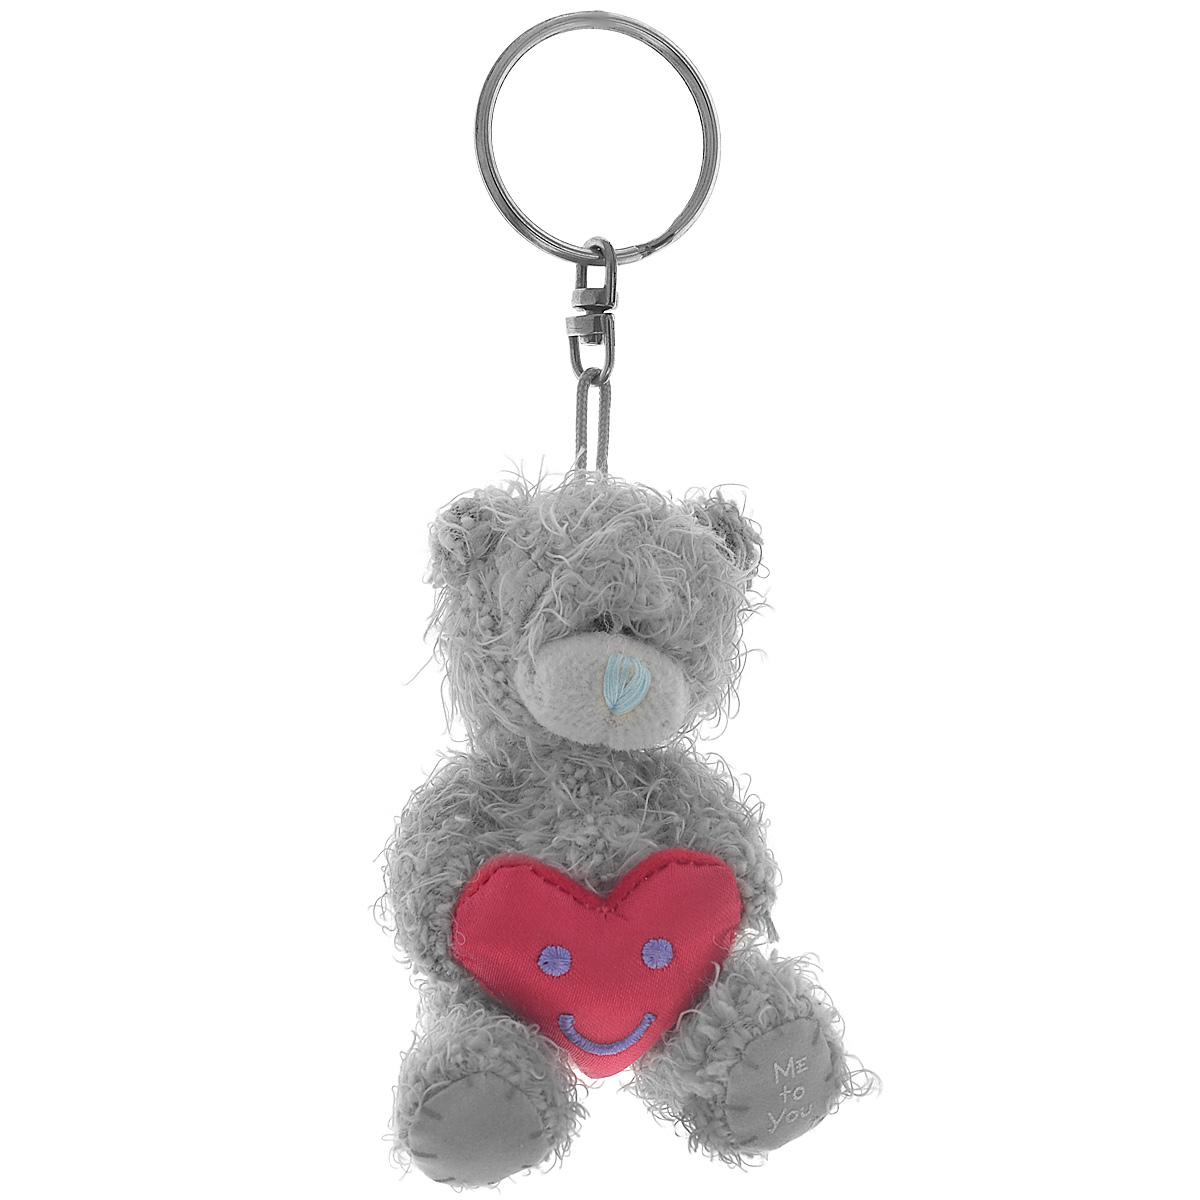 Мягкая игрушка-брелок Me to You Мишка Тедди, 7,5 см шланг подающий gardena 25 мм х 25 м 02792 20